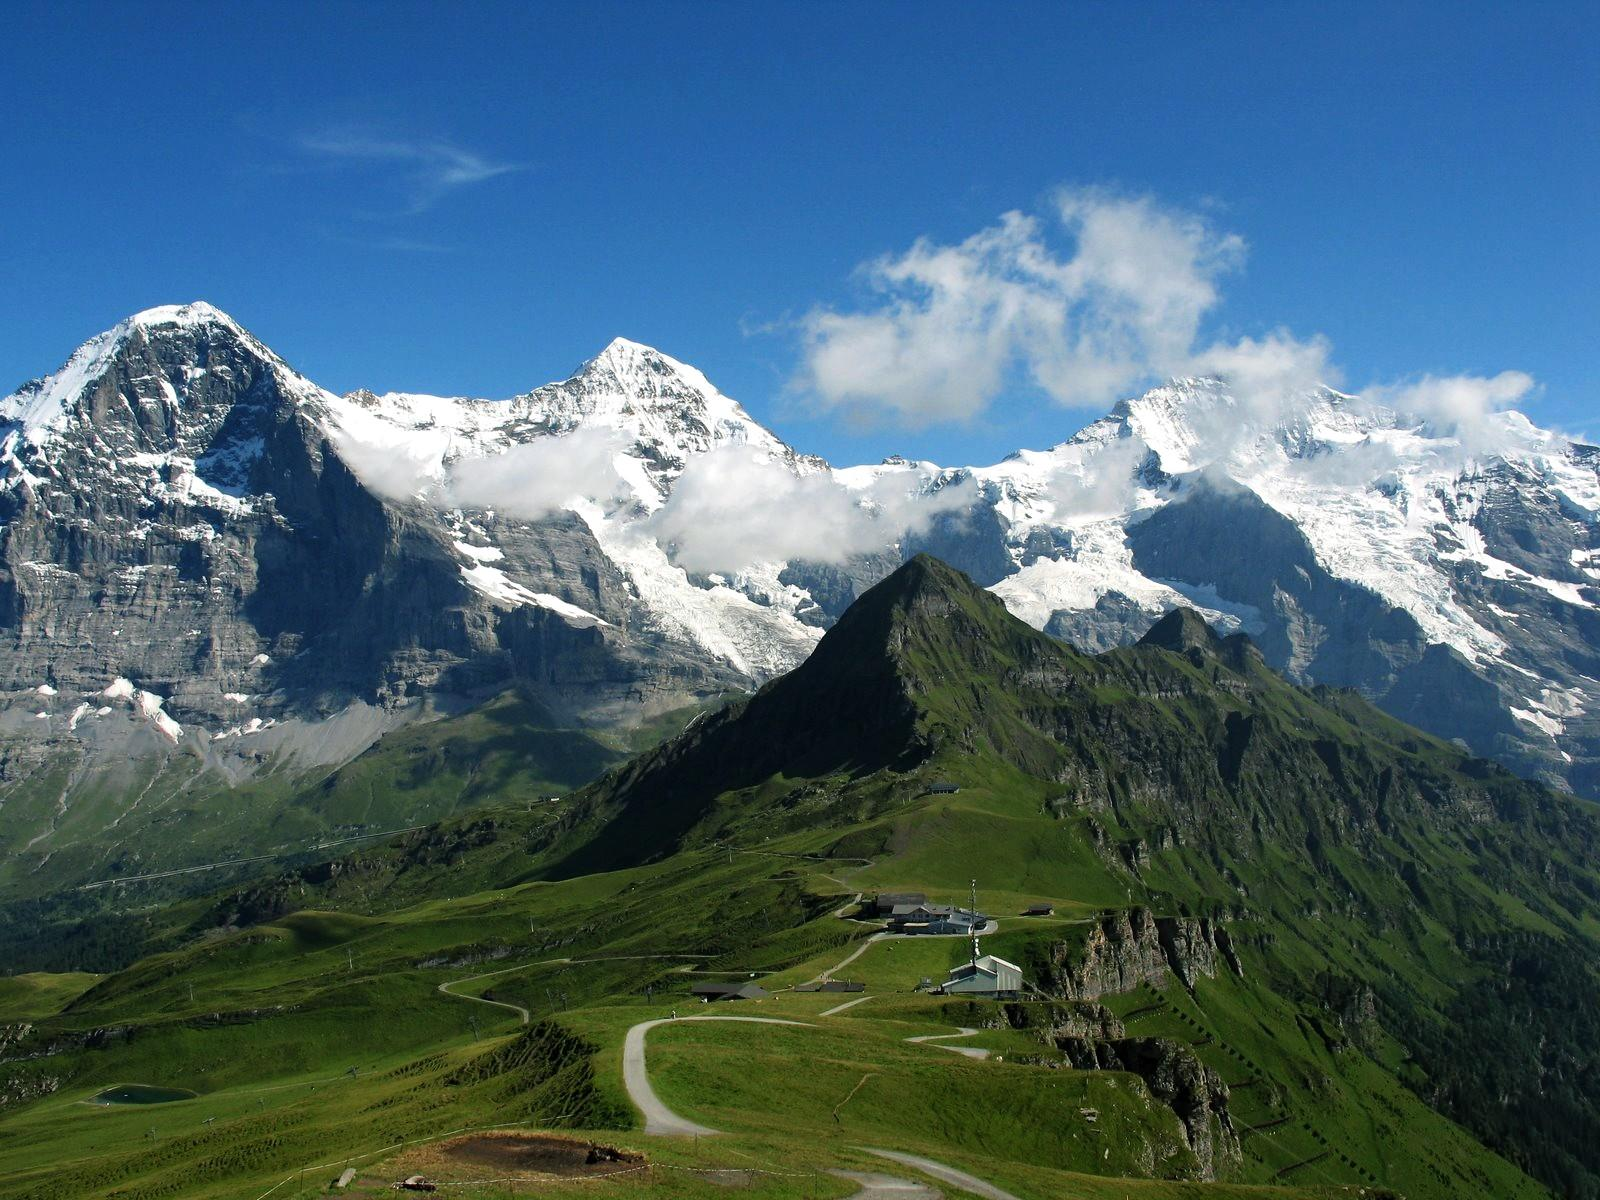 FileEiger Mnch und Jungfraujpg   Wikimedia Commons 1600x1200